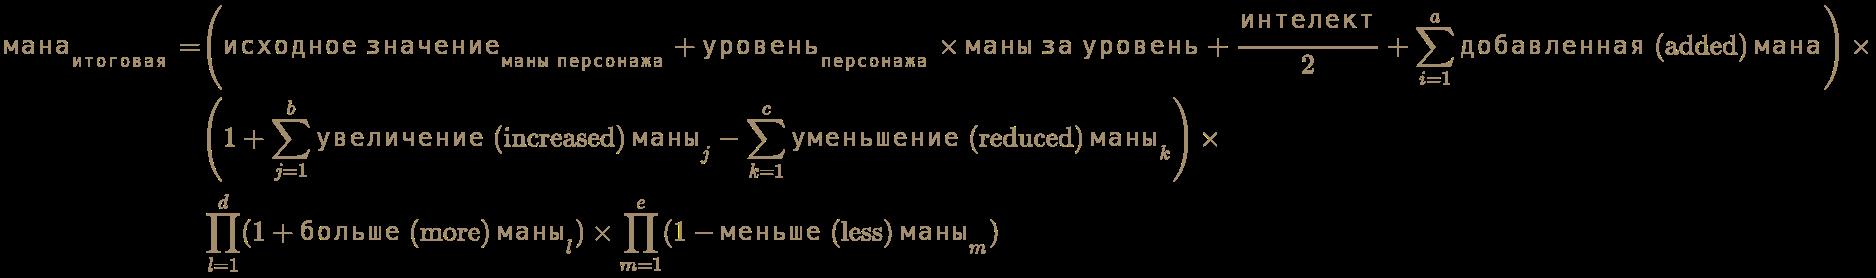 \color [rgb]{0.6392156862745098,0.5529411764705883,0.42745098039215684}{\begin{aligned}{\text{мана}}_{\text{итоговая}}=&\left({\text{исходное значение}}_{\text{маны персонажа}}+{\text{уровень}}_{\text{персонажа}}\times {\text{маны за уровень}}+{\frac {\text{интелект}}{2}}+\sum _{i=1}^{a}{\text{добавленная (added) мана}}\right)\times \\&\left(1+\sum _{j=1}^{b}{\text{увеличение (increased) маны}}_{j}-\sum _{k=1}^{c}{\text{уменьшение (reduced) маны}}_{k}\right)\times \\&\prod _{l=1}^{d}(1+{\text{больше (more) маны}}_{l})\times \prod _{m=1}^{e}(1-{\text{меньше (less) маны}}_{m})\end{aligned}}